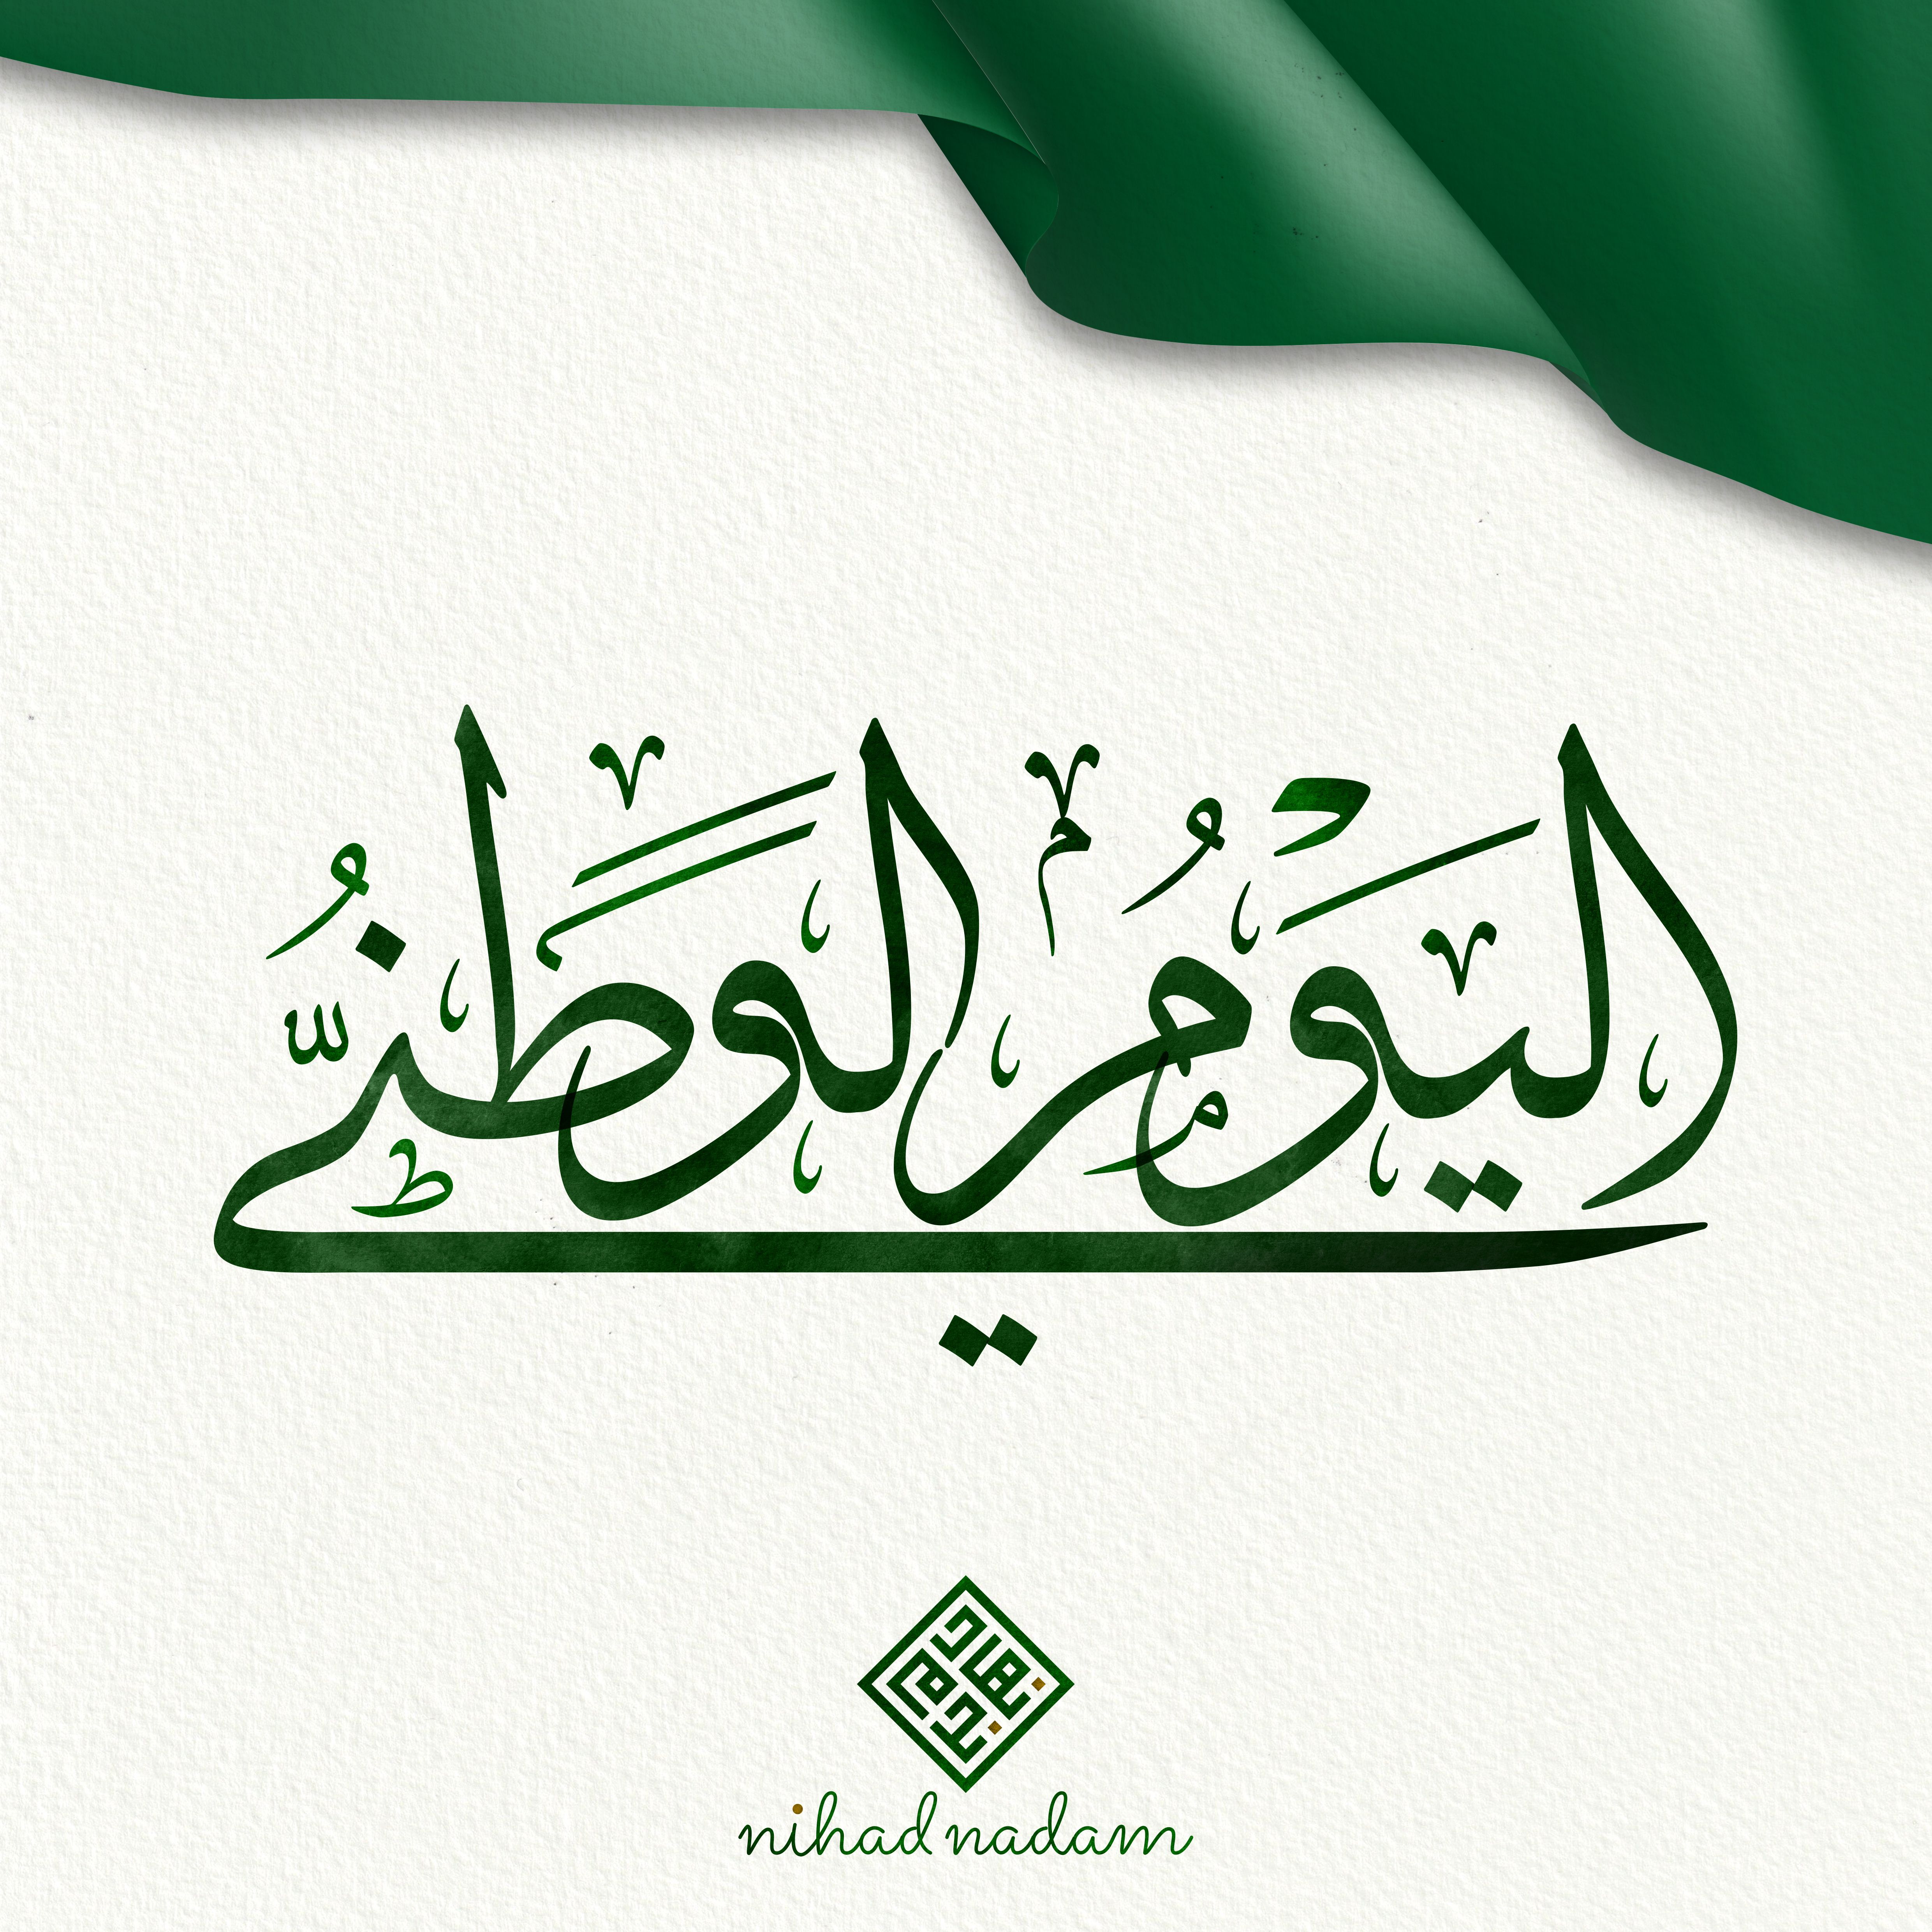 Saudi National Day Design National Day Saudi Photography Inspiration Portrait Eid Images